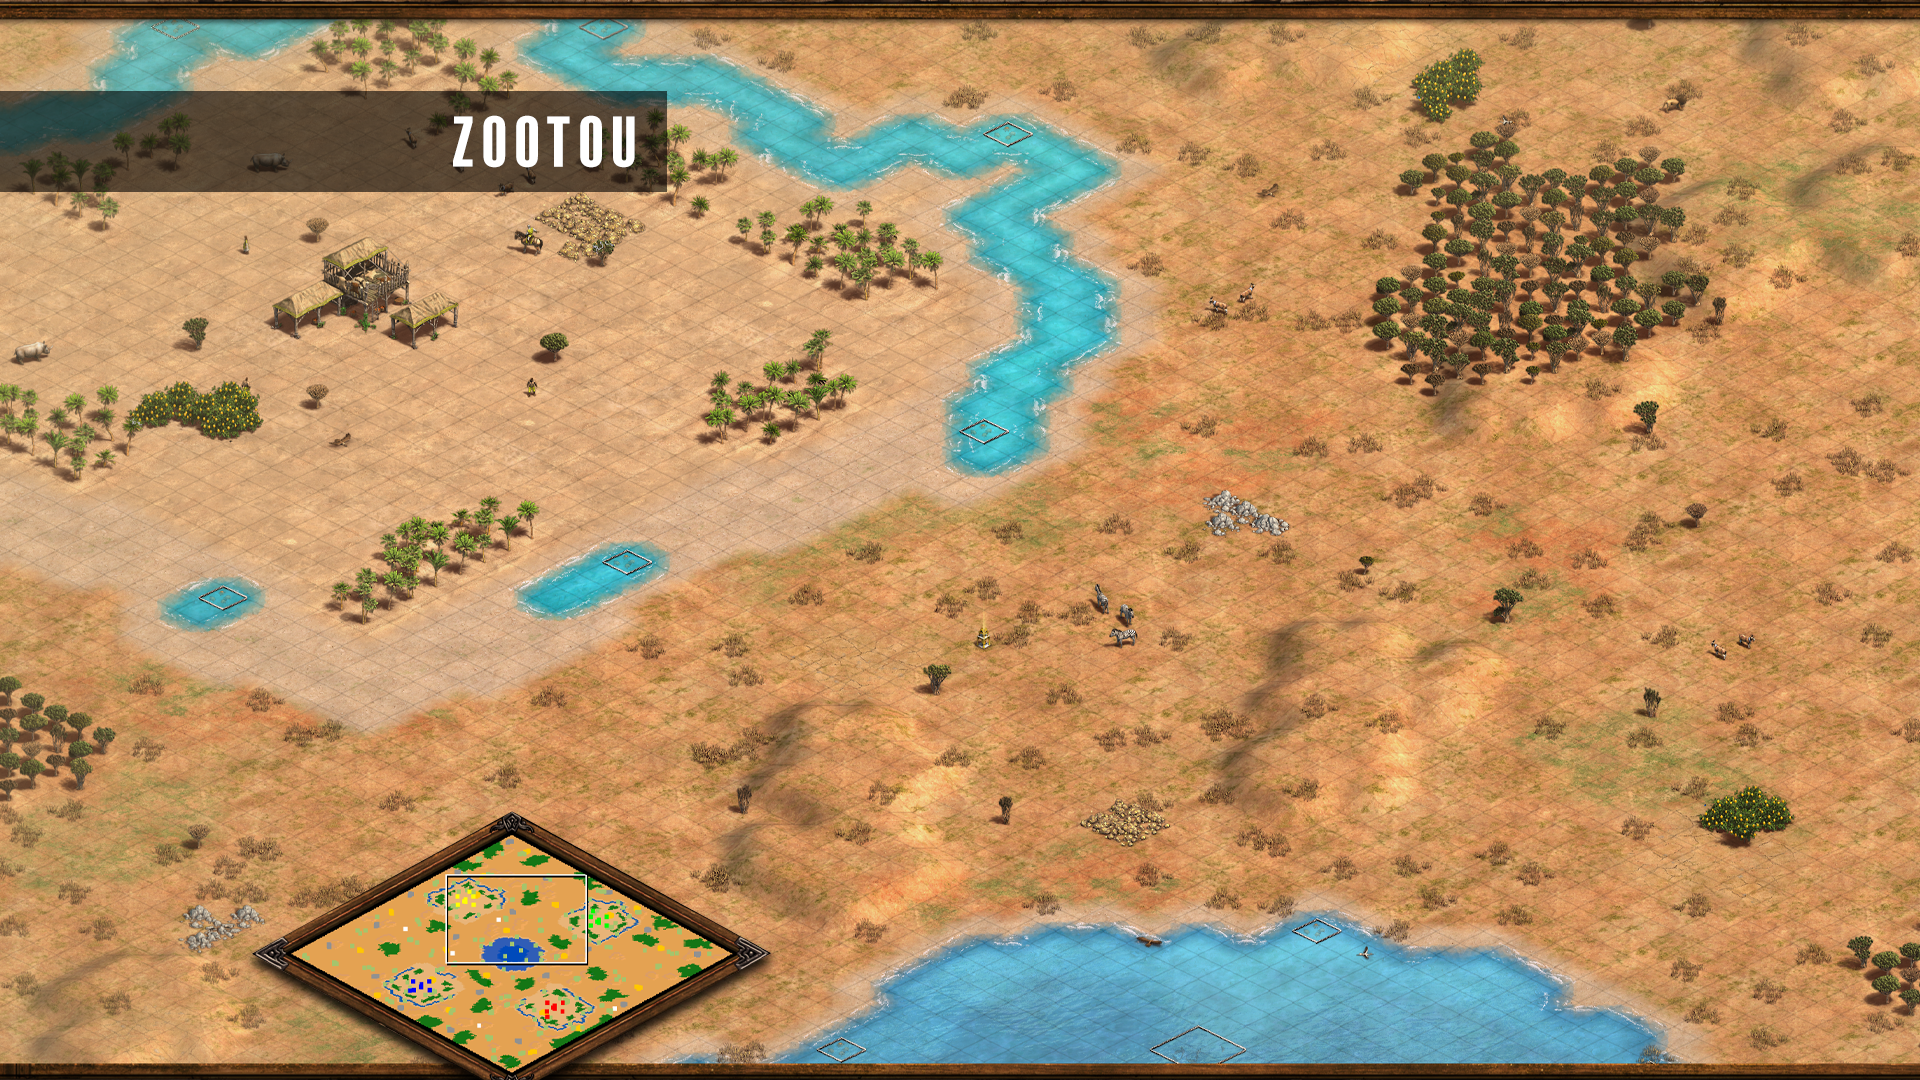 Zootou.png